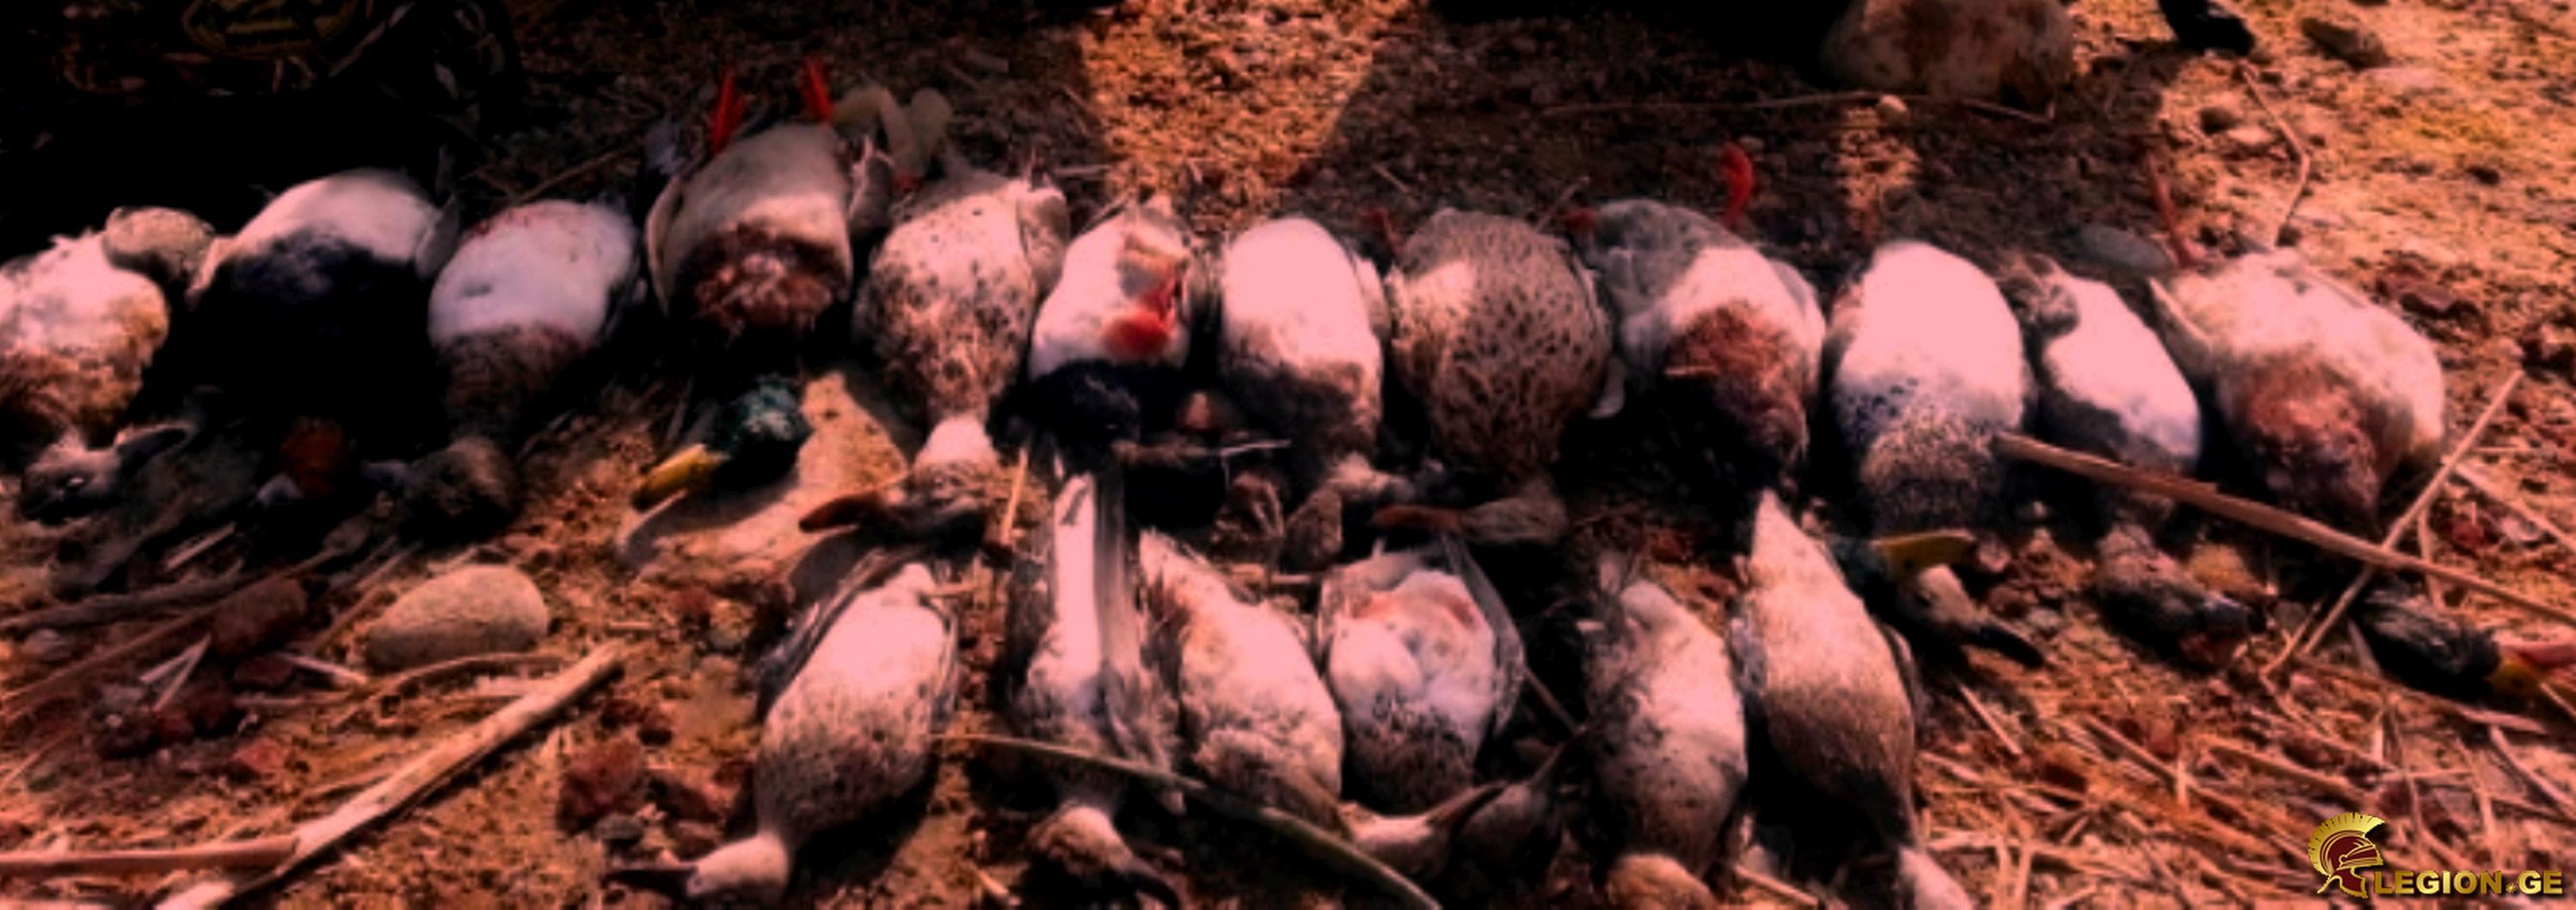 pre_1461689703__colorado-duck-hunting-wa